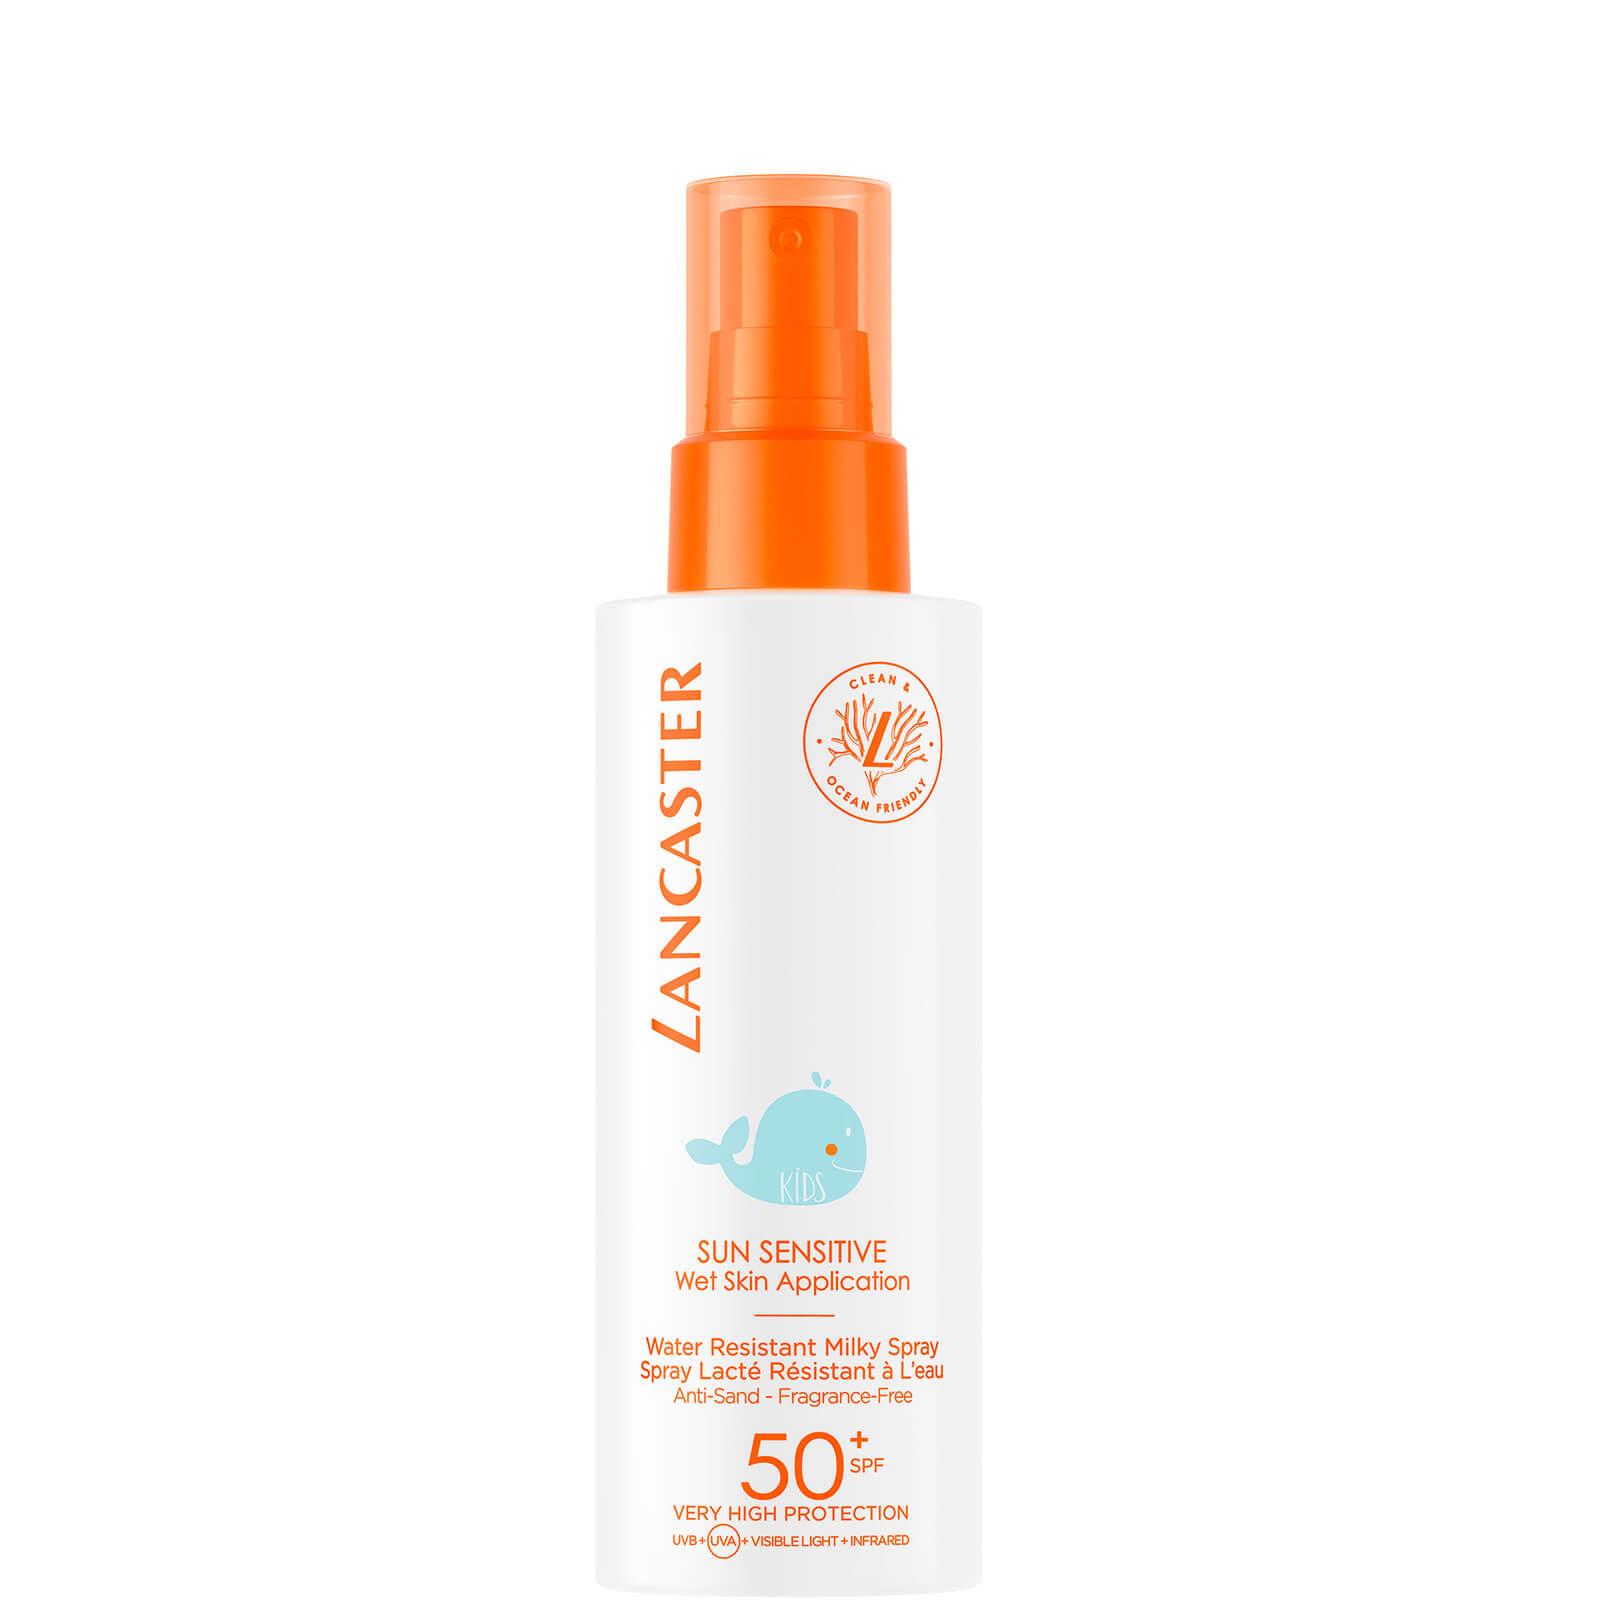 Lancaster Sun Sensitive Face and Body Sun Protection Cream For Kids SPF50 150ml